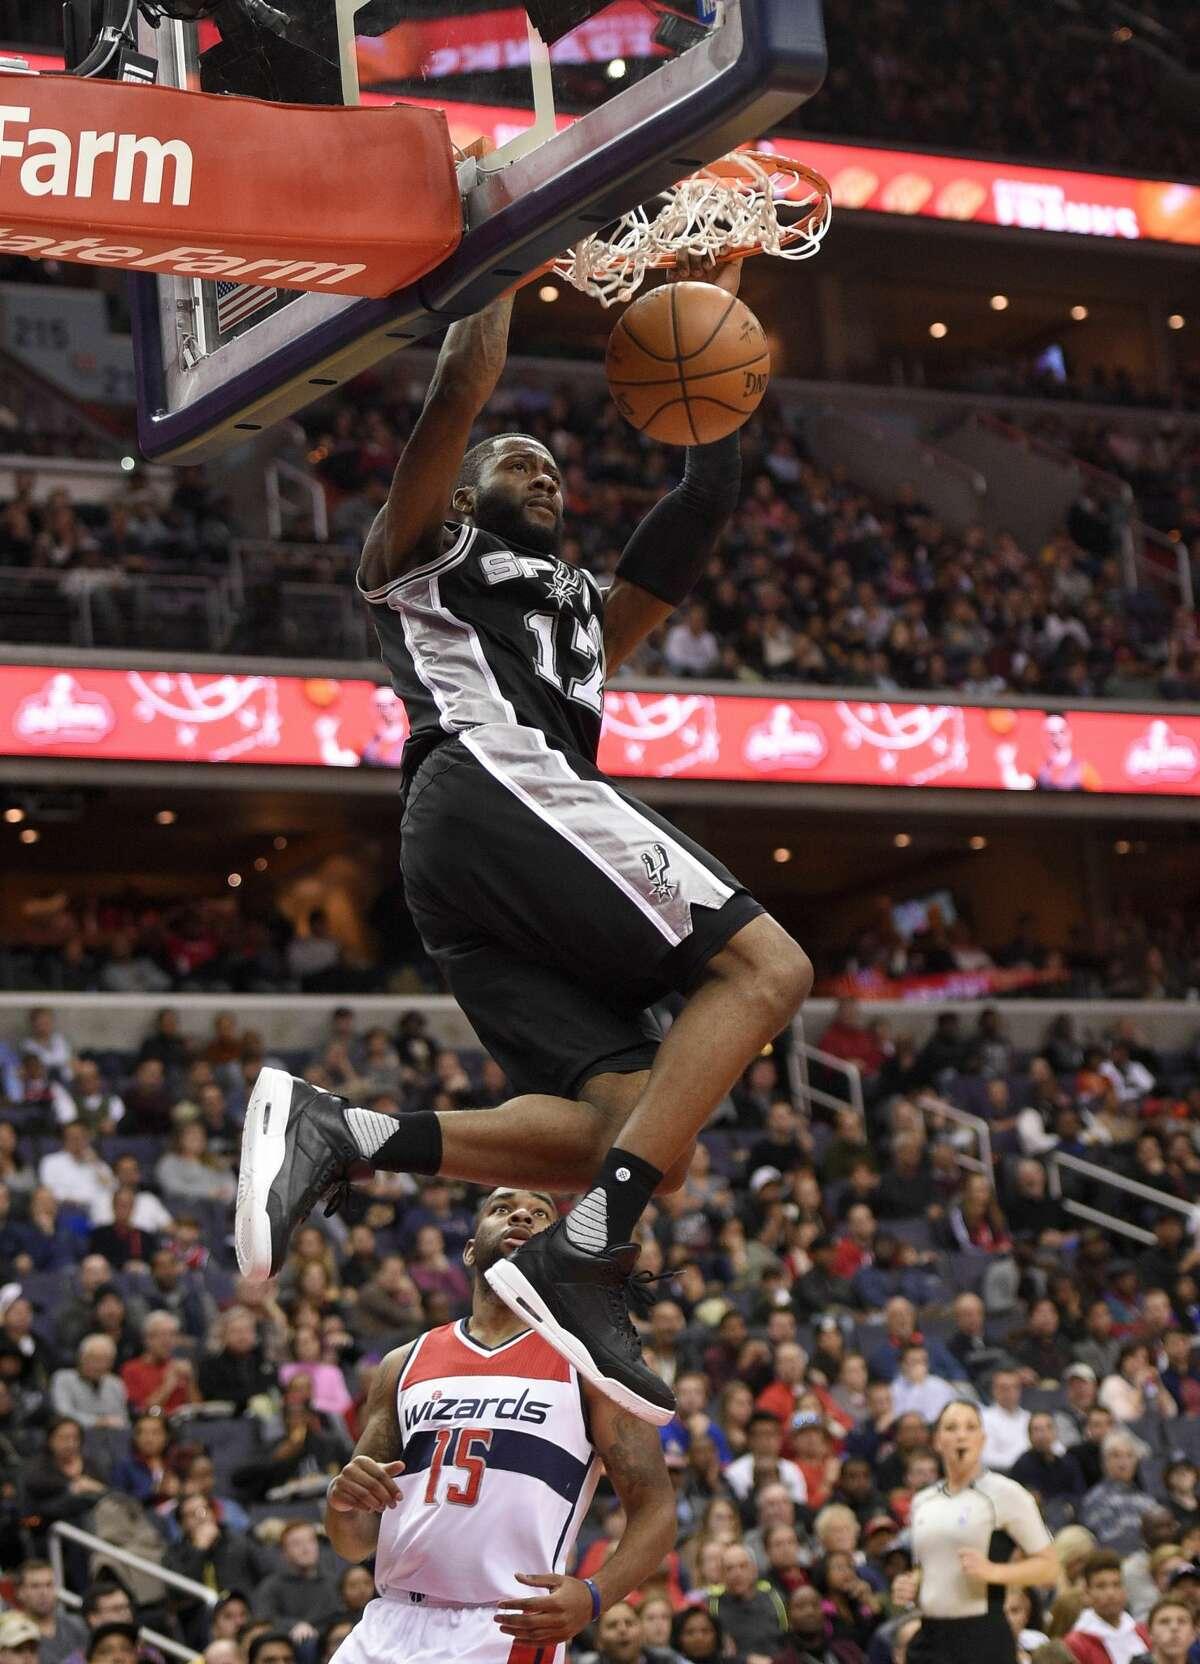 San Antonio Spurs guard Jonathon Simmons (17) dunks against Washington Wizards guard Marcus Thornton (15) during the second half of an NBA basketball game, Saturday, Nov. 26, 2016, in Washington. The Spurs won 112-100. (AP Photo/Nick Wass)